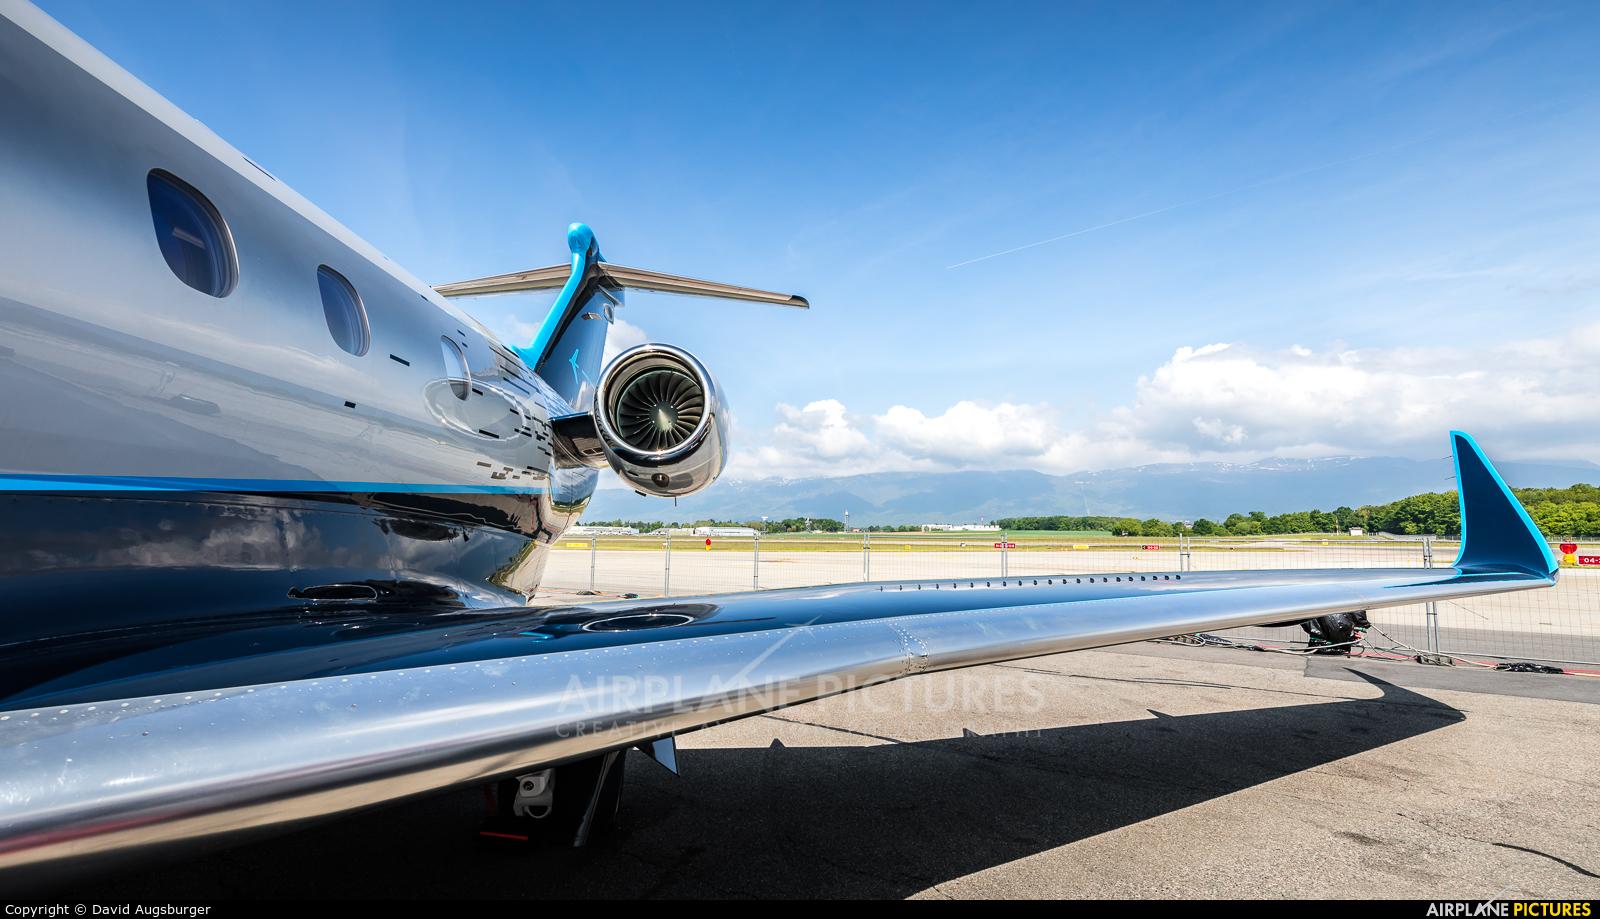 Embraer Executive Aircraft Inc PR-ZTX aircraft at Geneva Intl